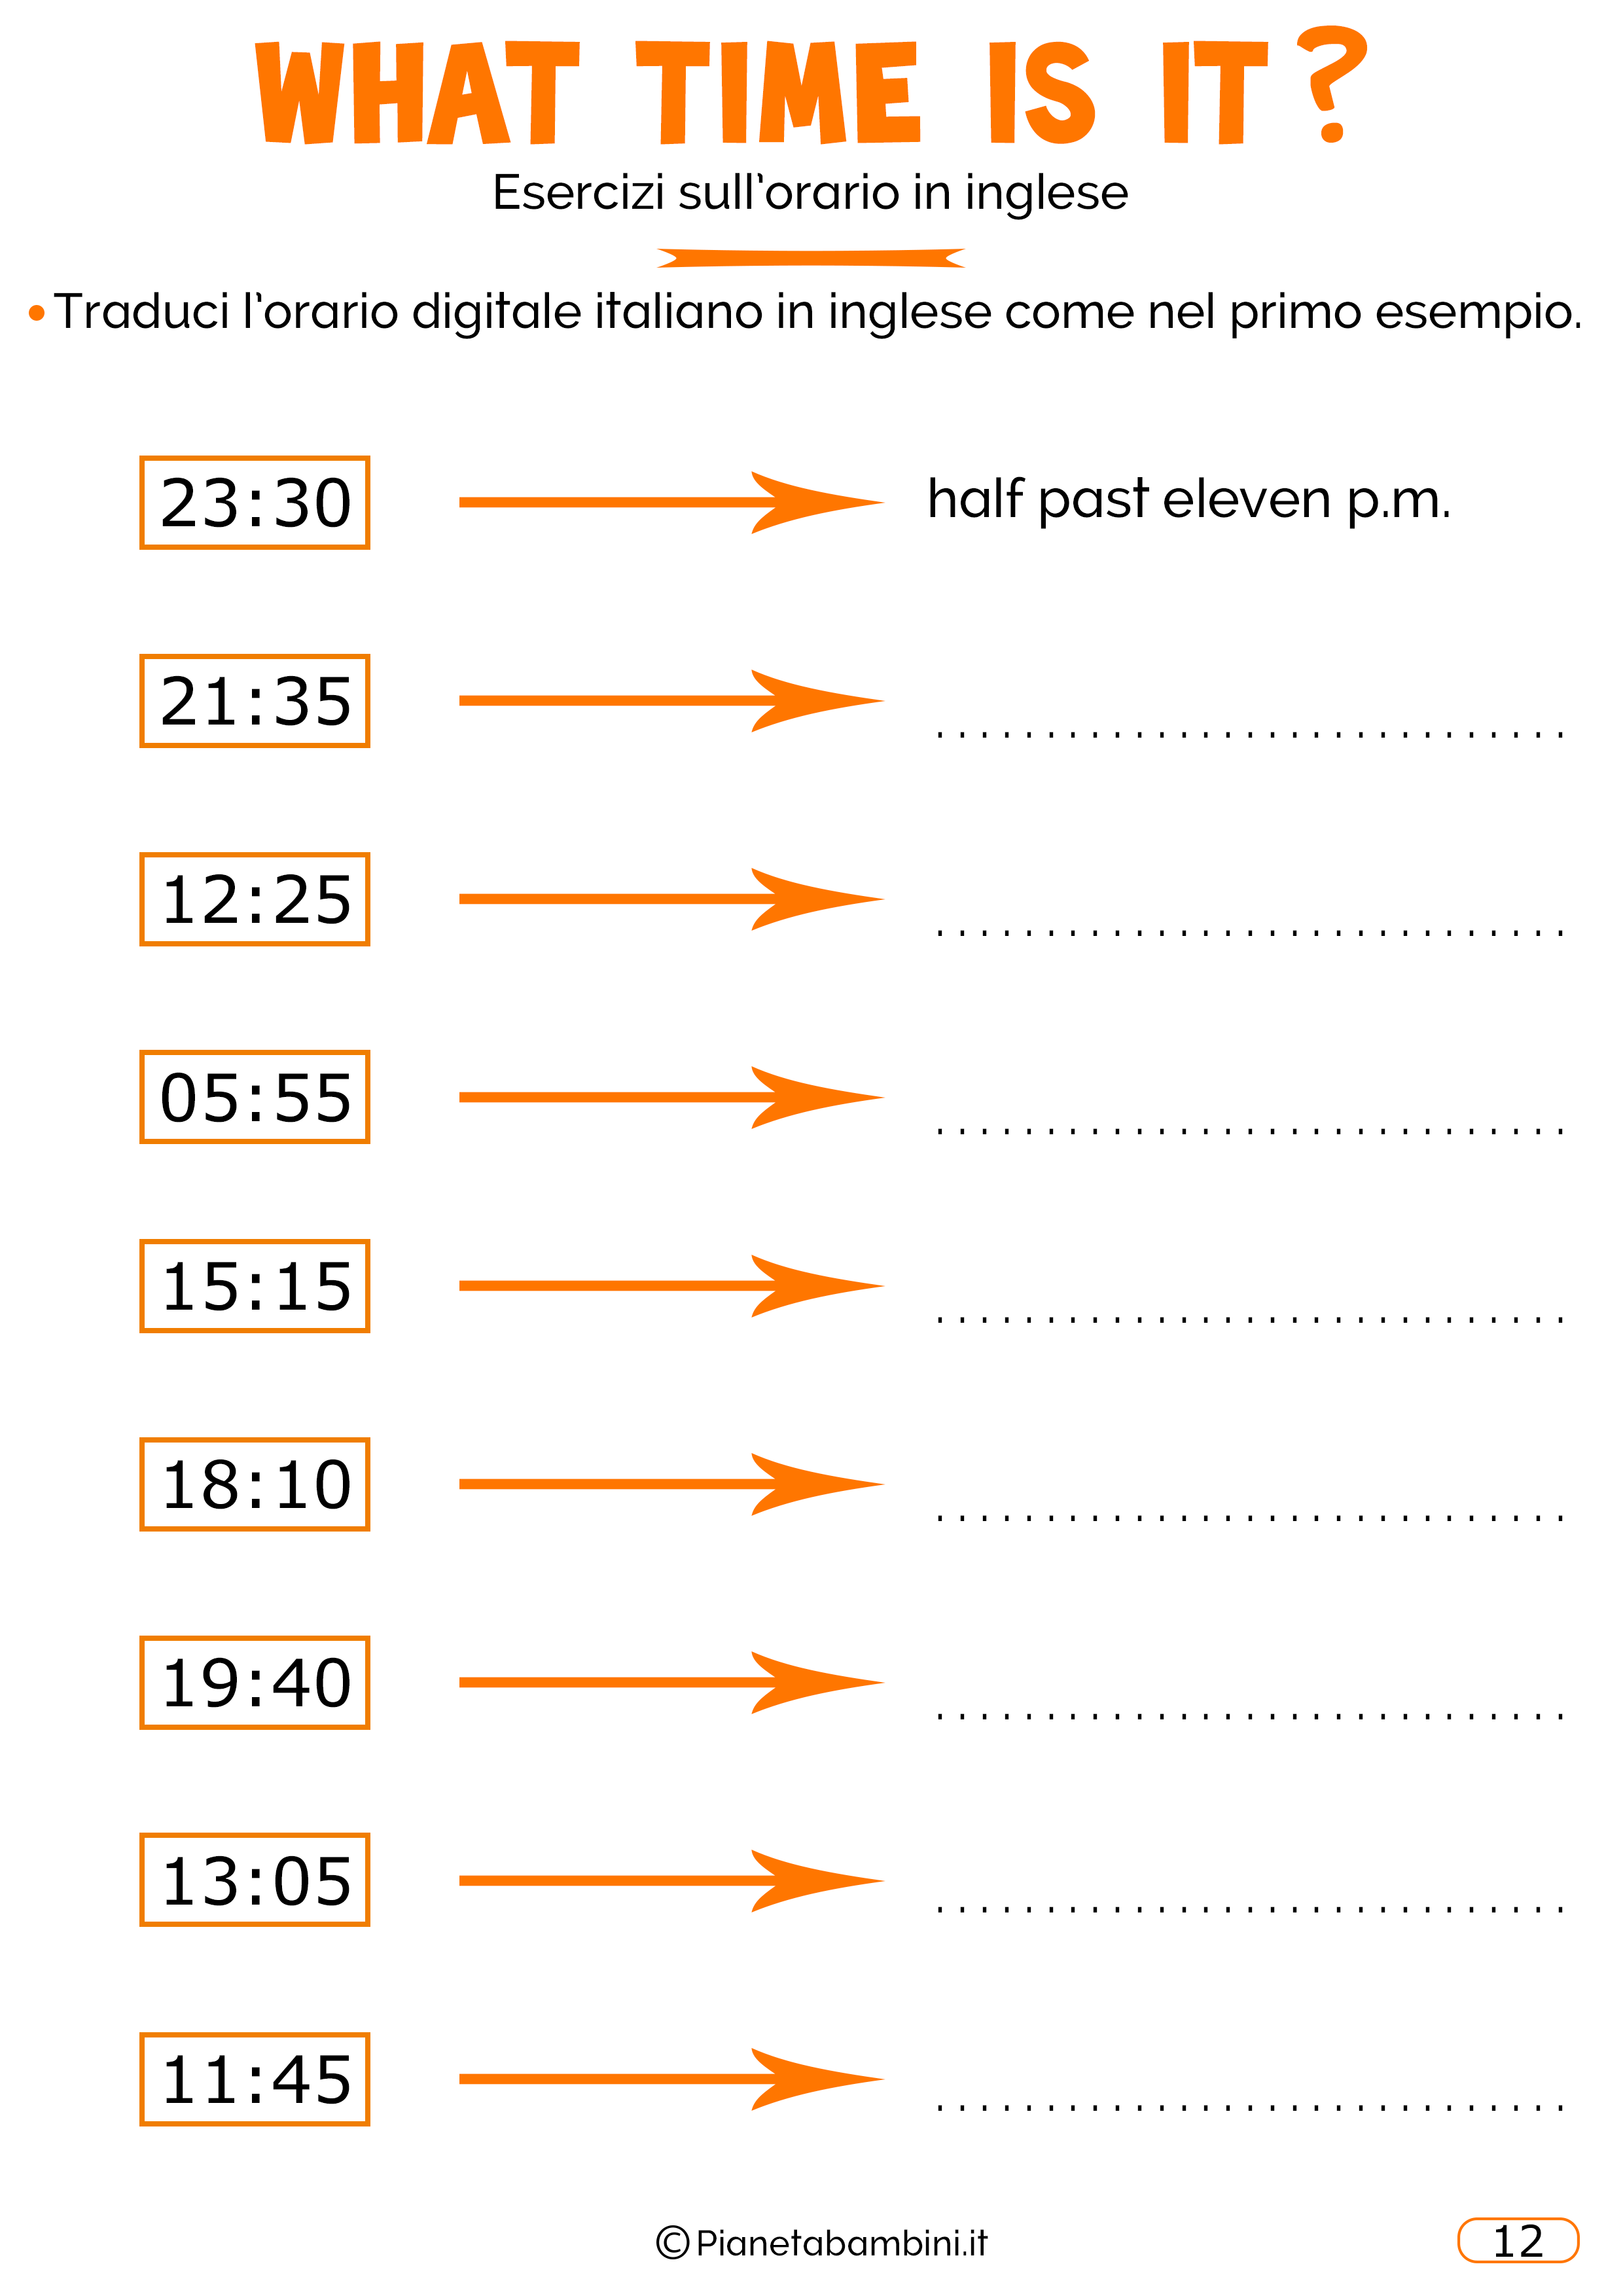 Esercizi-Orario-Inglese-12